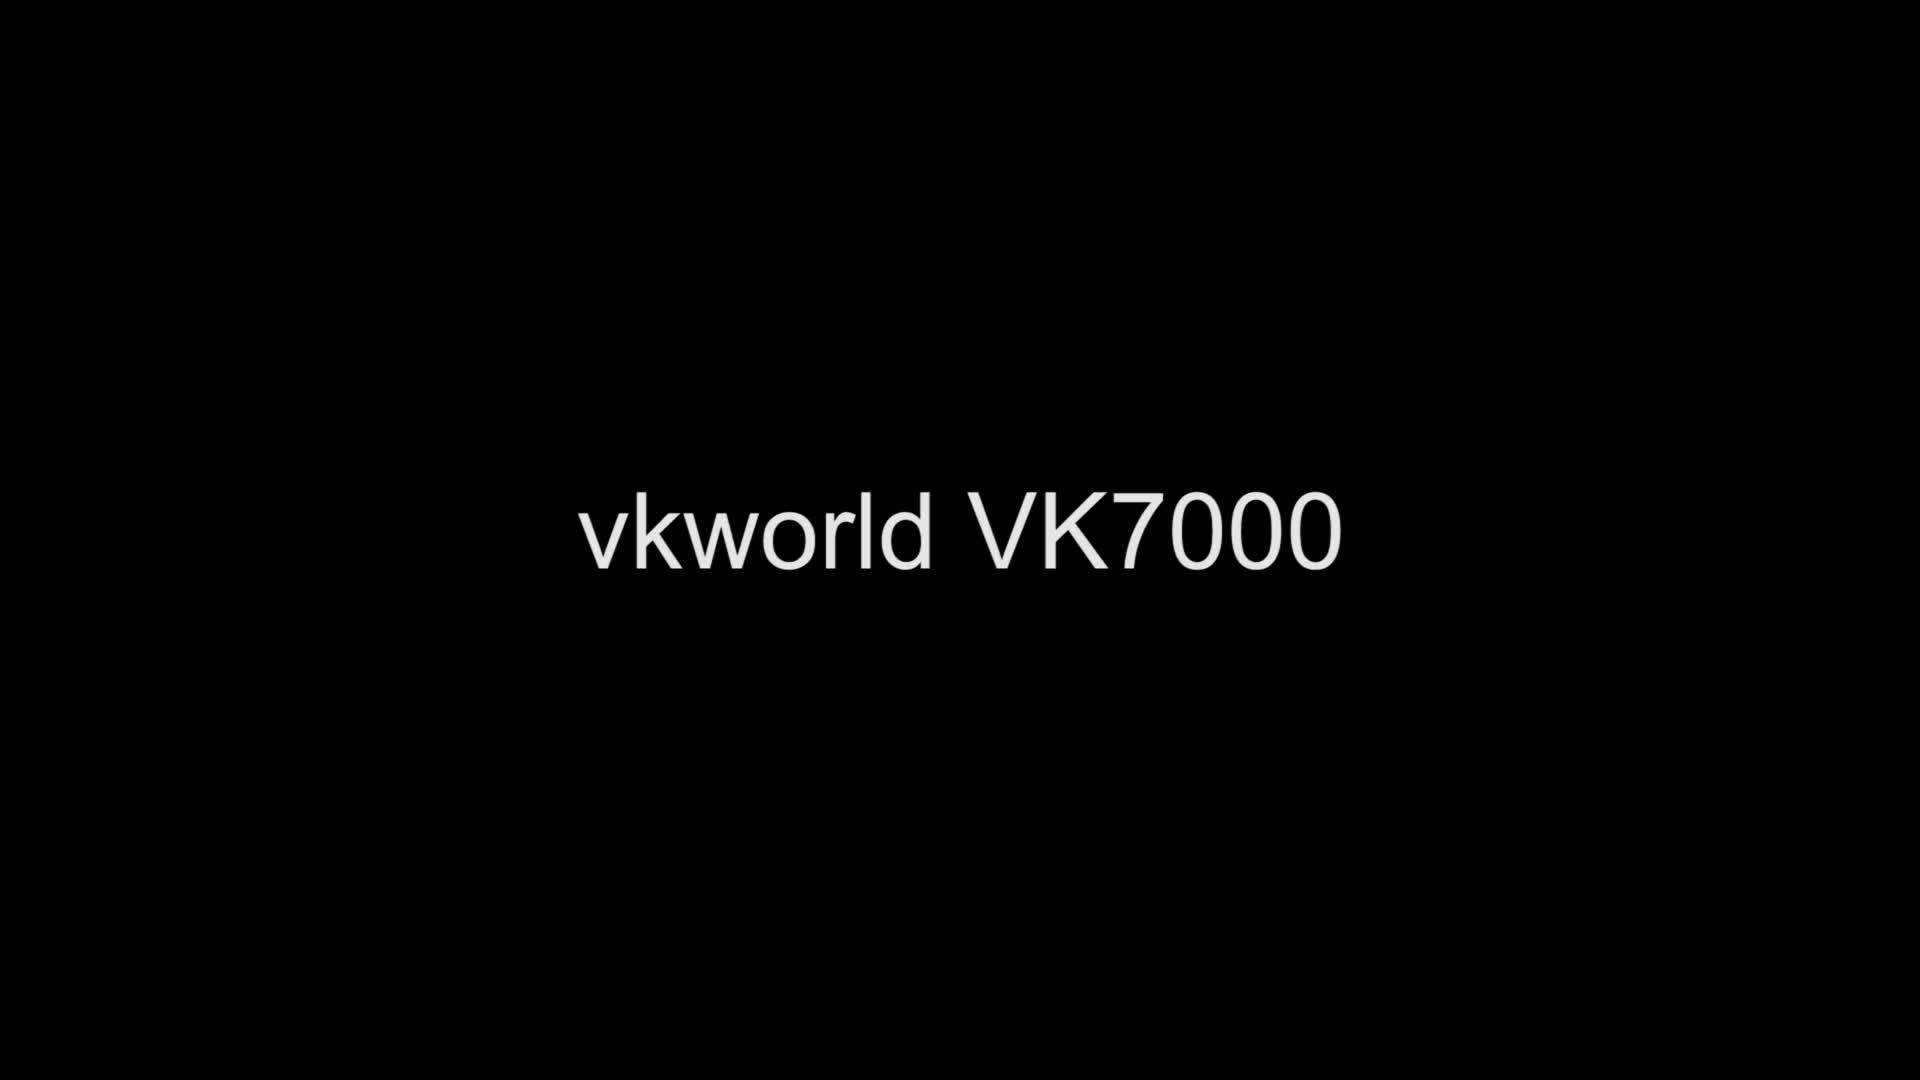 Hot Sale Celulares Smartphones 4G 5.2'' Corning Gorilla Glass 5 VKworld VK7000 Waterproof IP68 Android Wireless Charge phones